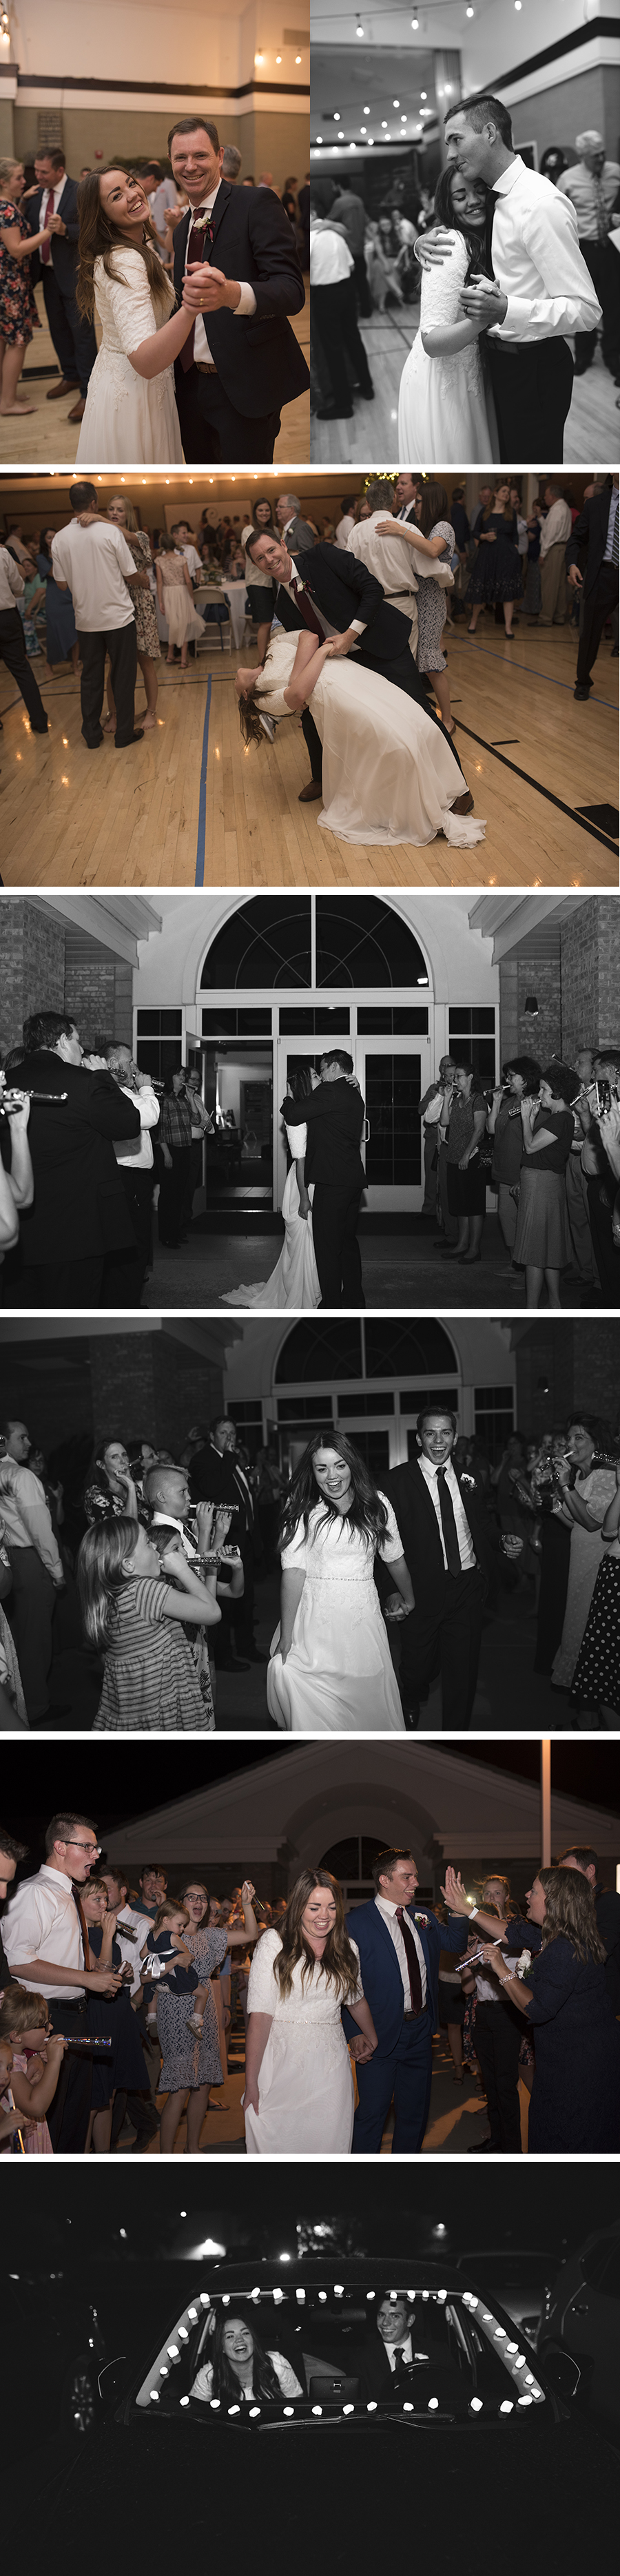 gilbert temple wedding photographer blog 2.jpg